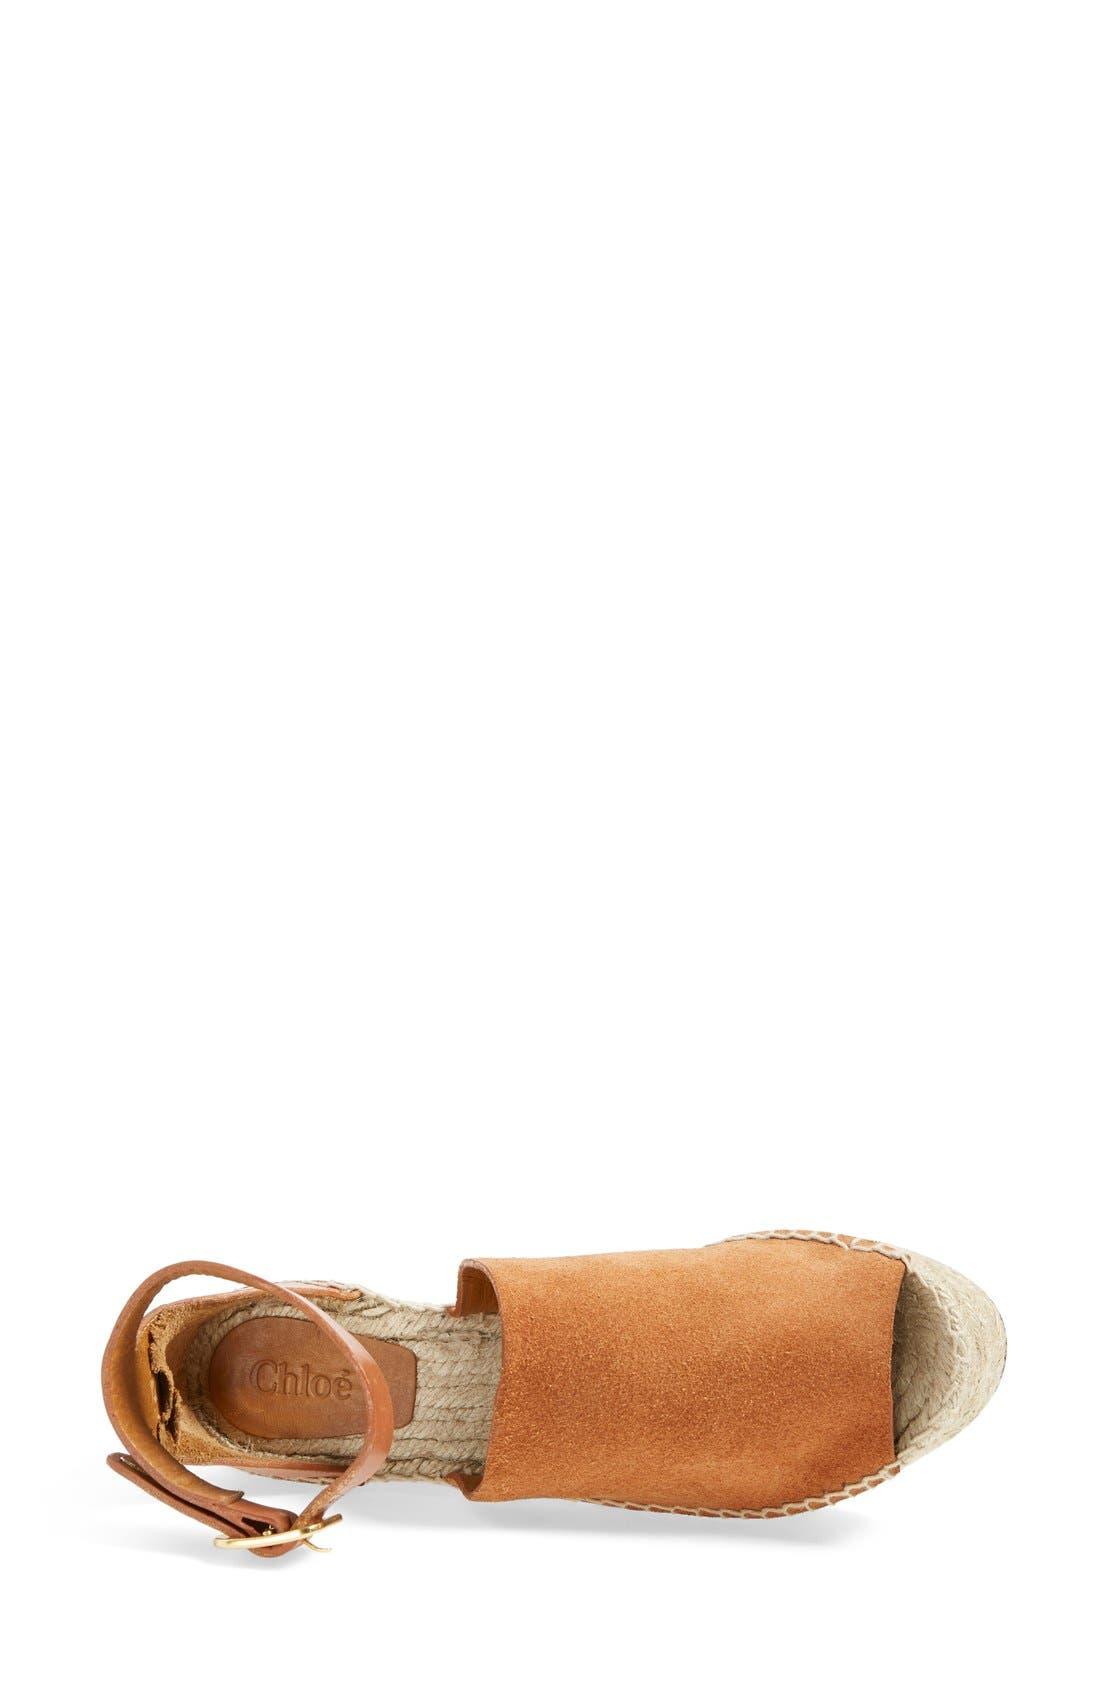 Alternate Image 3  - Chloé 'Isa' Espadrille Wedge Sandal (Women)